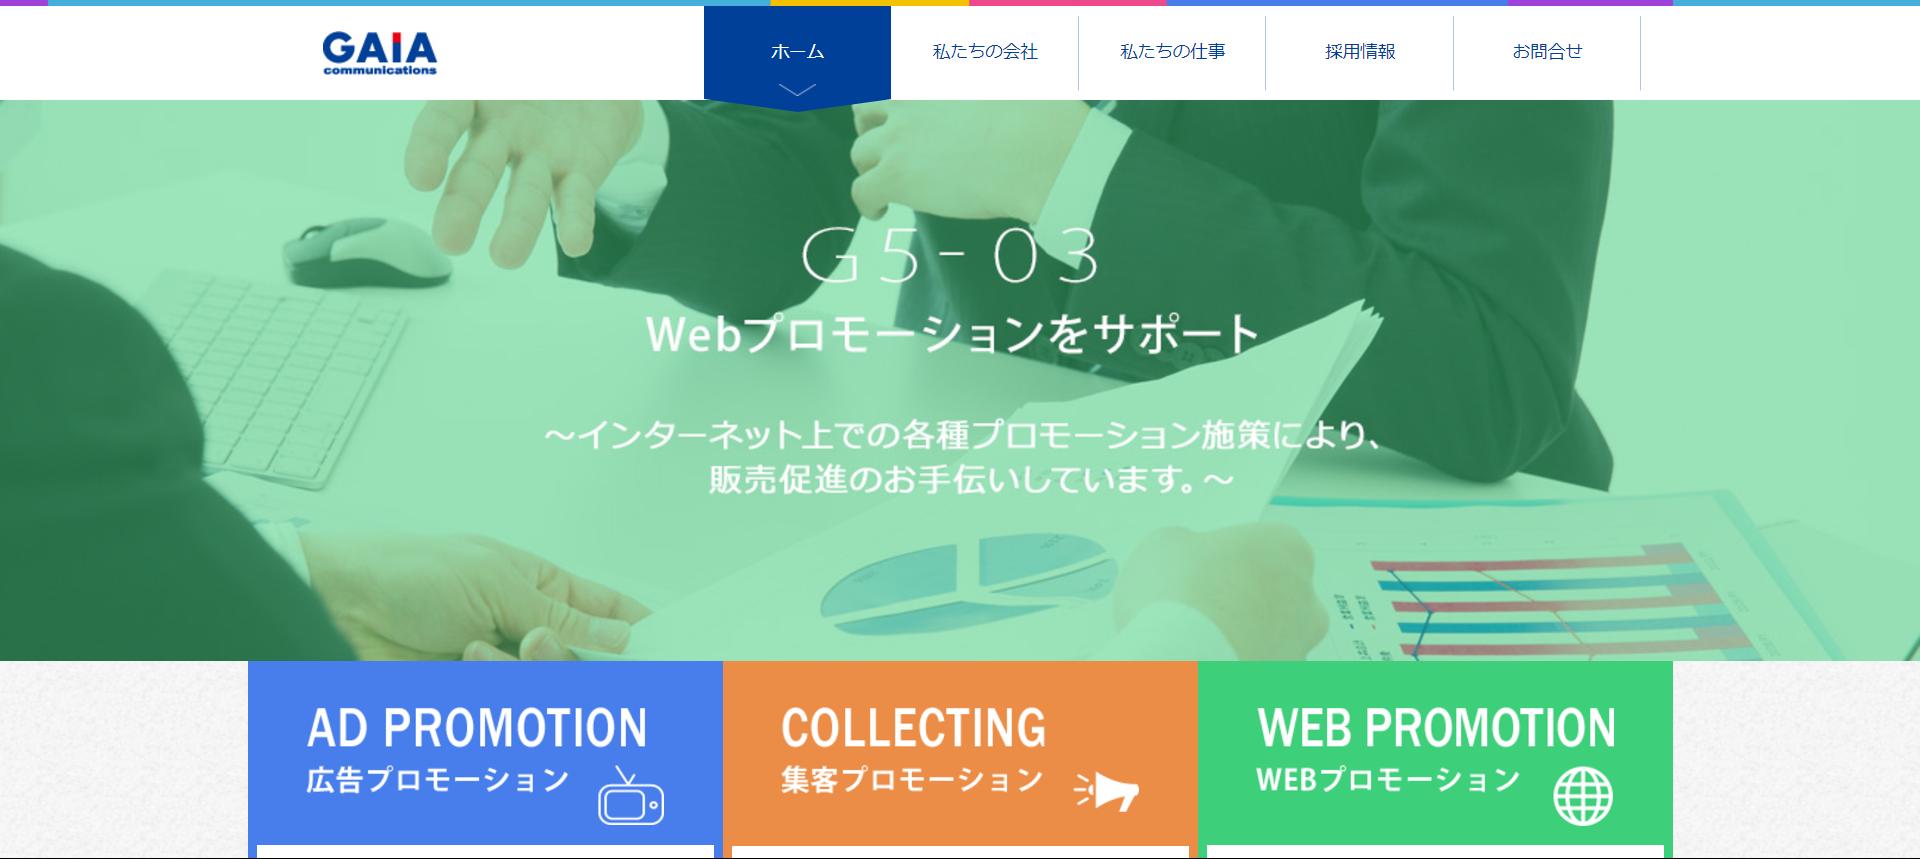 FireShot Capture 180 - 販売促進・広告プロモーションのガイアコミュニケーションズ - http___gaia-ad.co.jp_